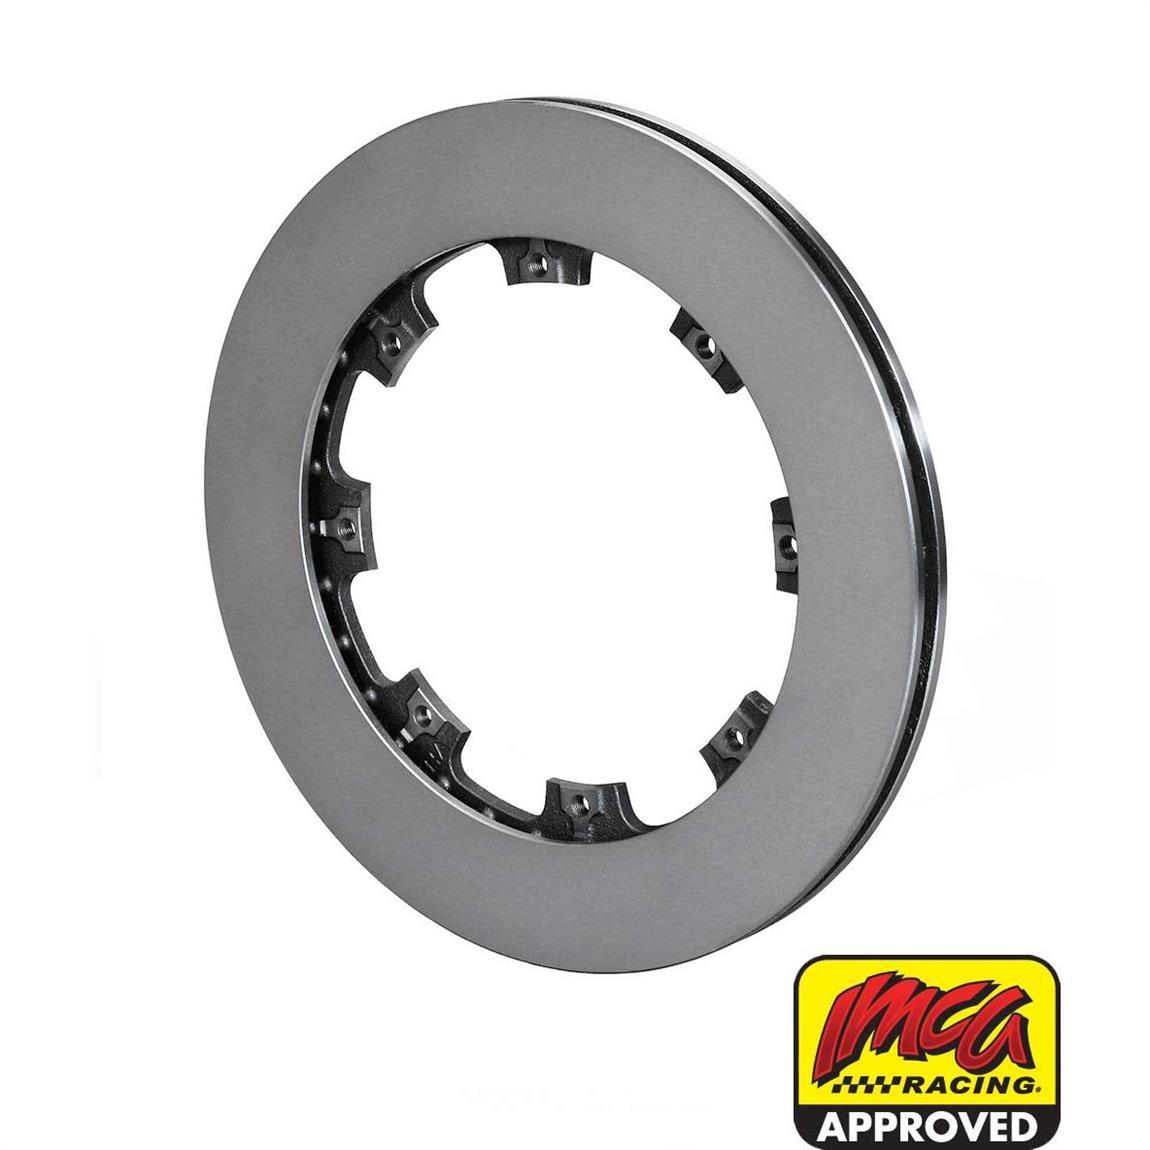 Speedway Pro-Lite Vented Brake Rotor 12.19 x .81 Inch